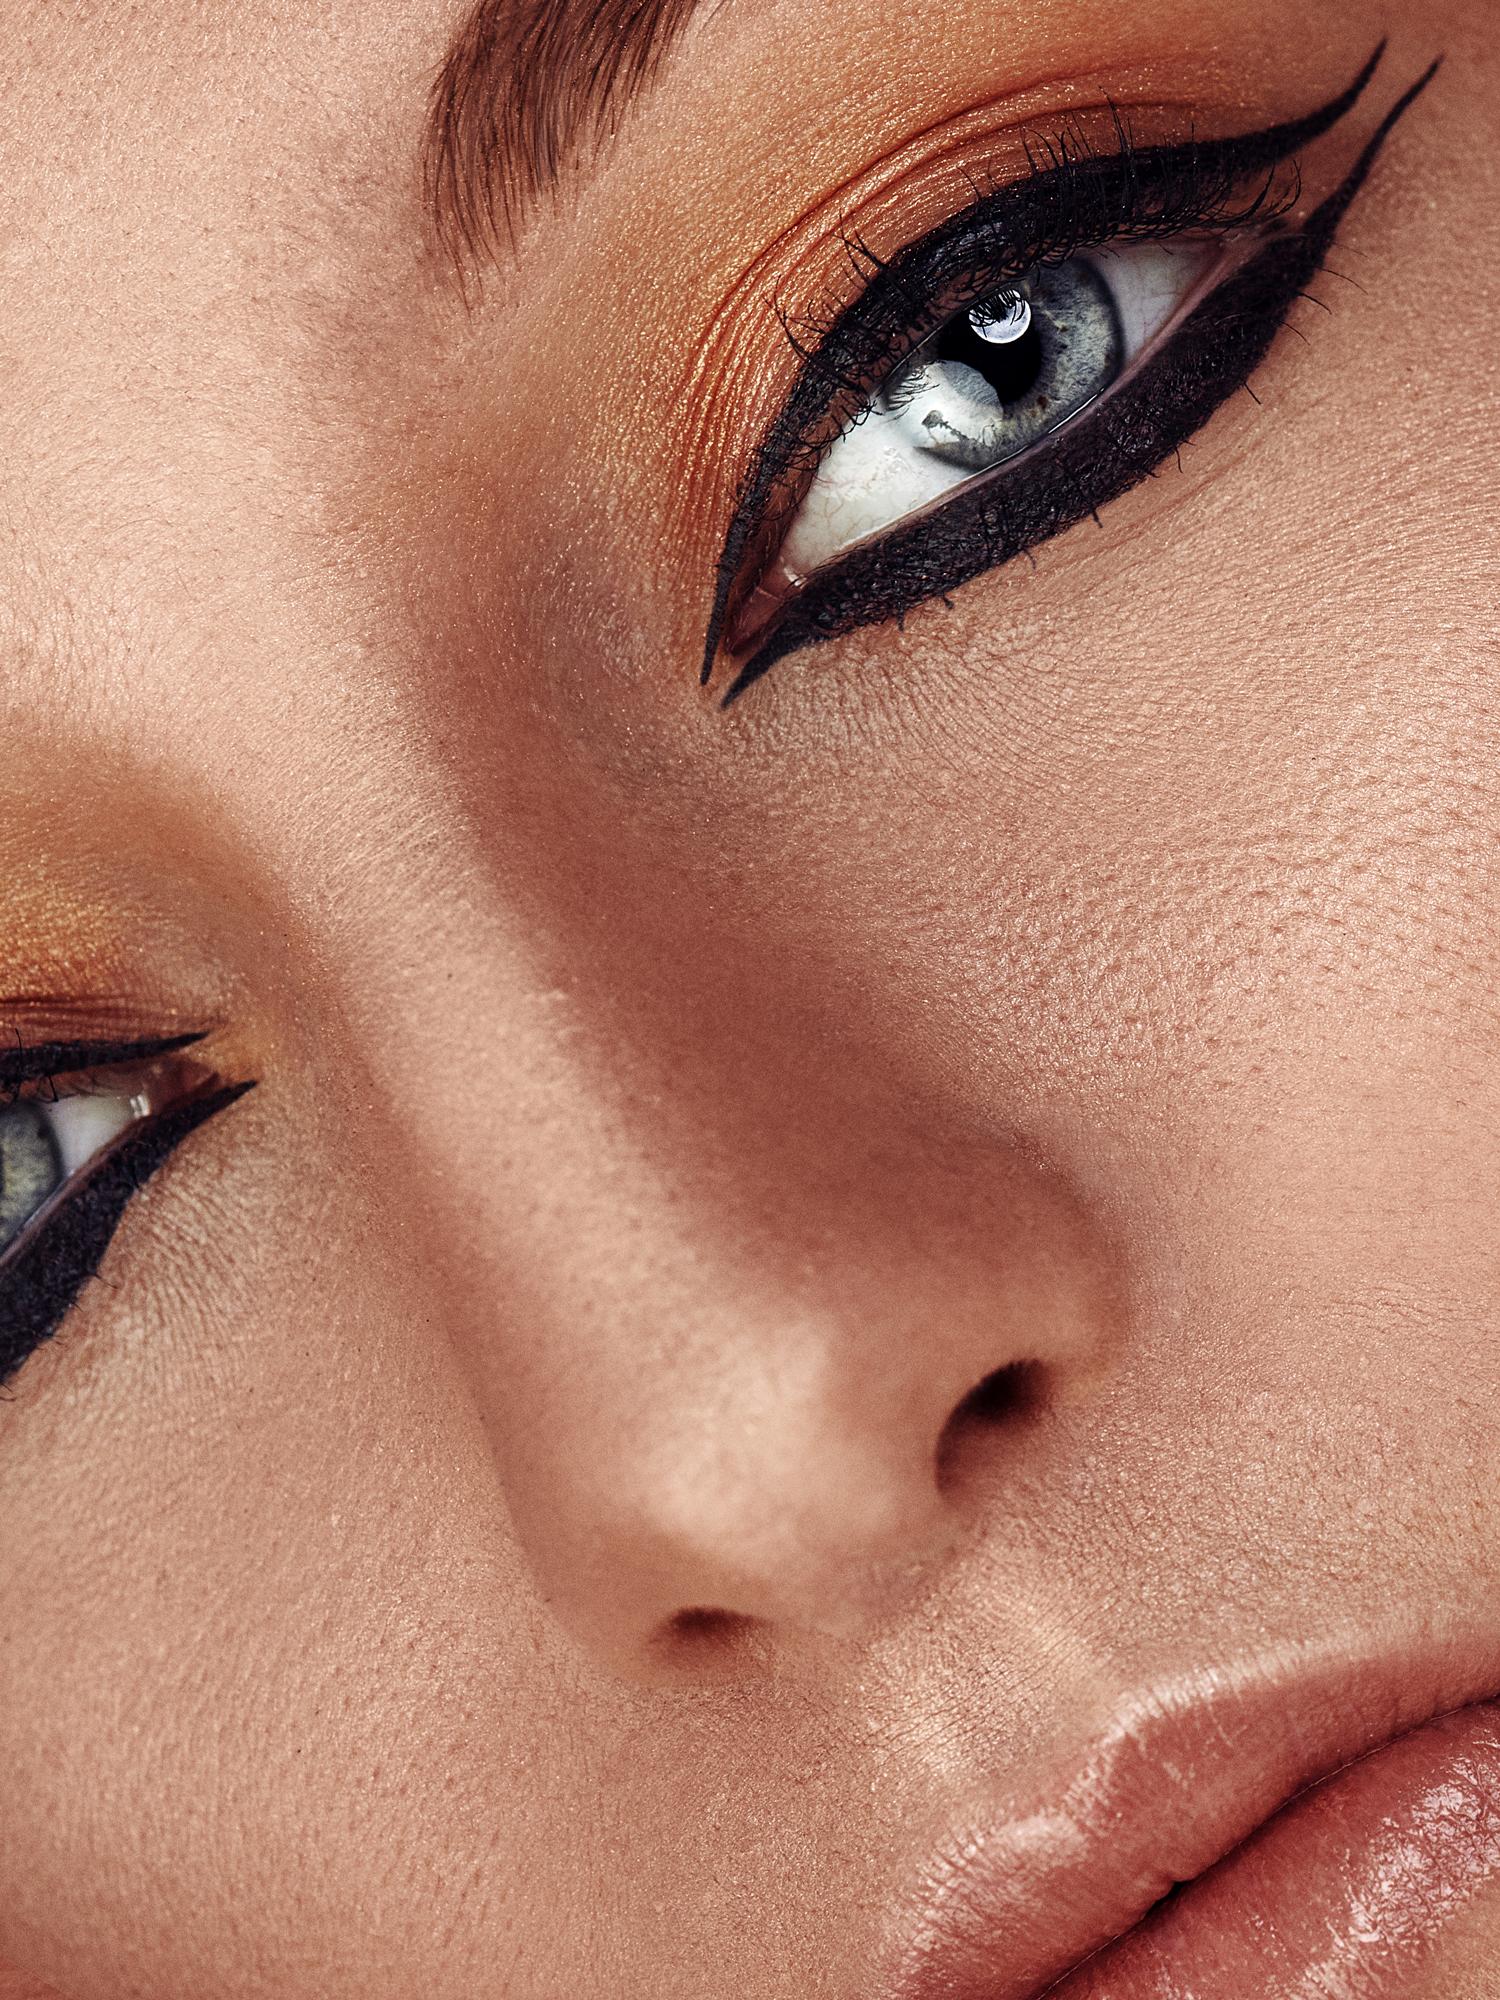 #beauty #egypt #makeup #closeup #robert #forester #robertforester #robdudeart #shooting #studio #indoor #eyes #portrait #editorial #photography #model #glam #glamor #glamorous #fashion